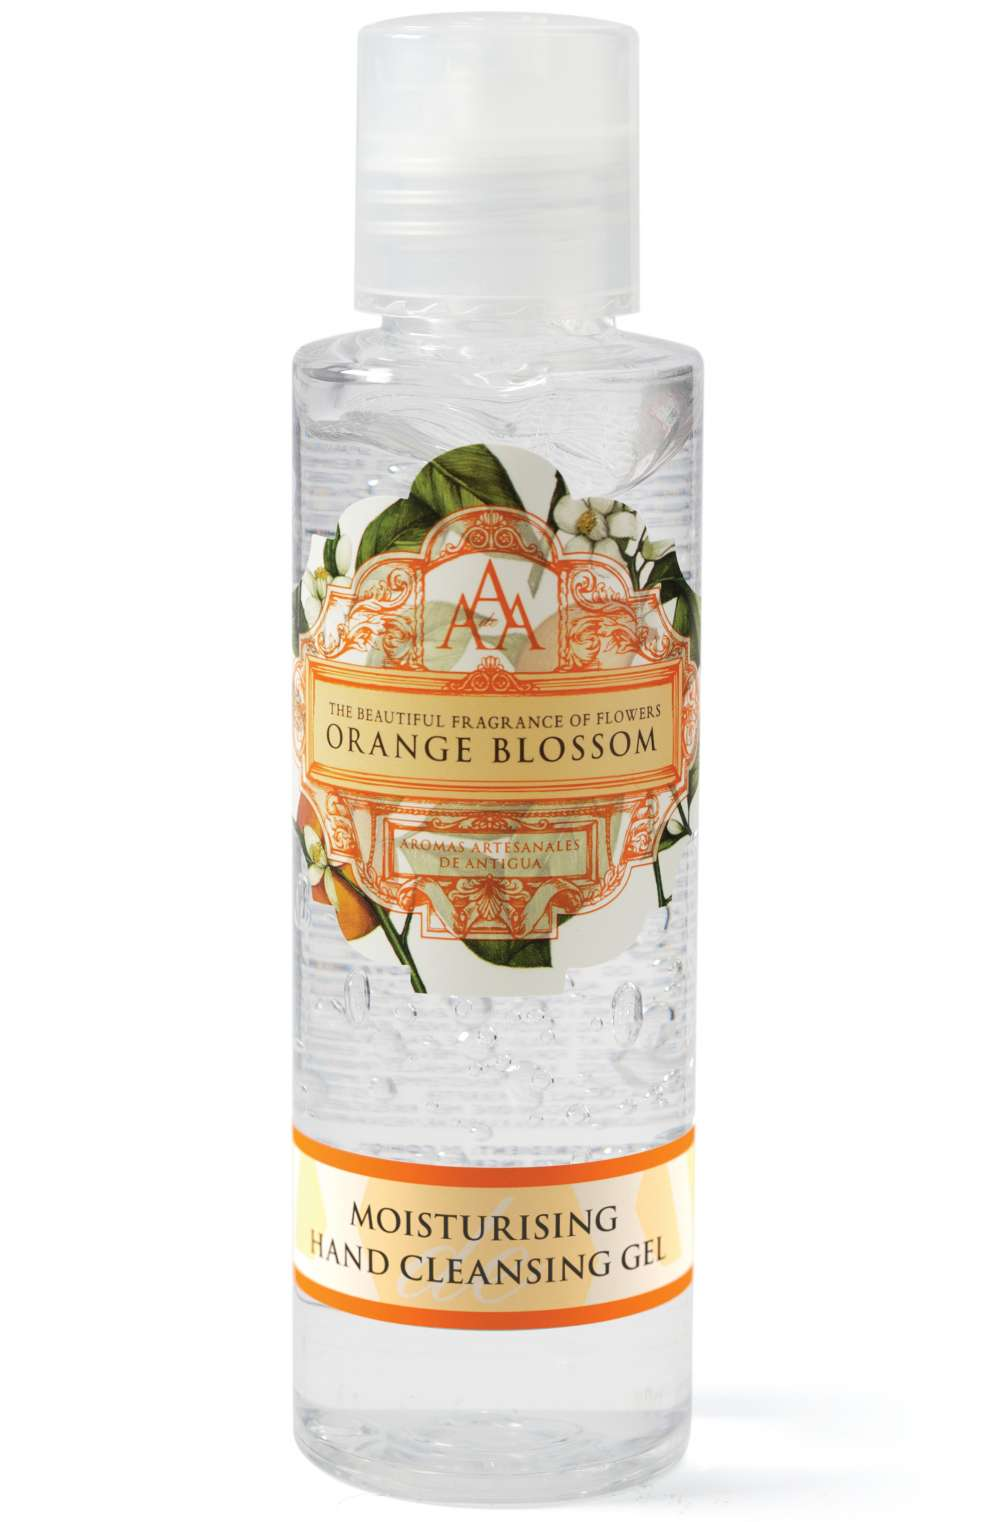 AAA Orange Blossom Moisturising Hand Cleansing Gel